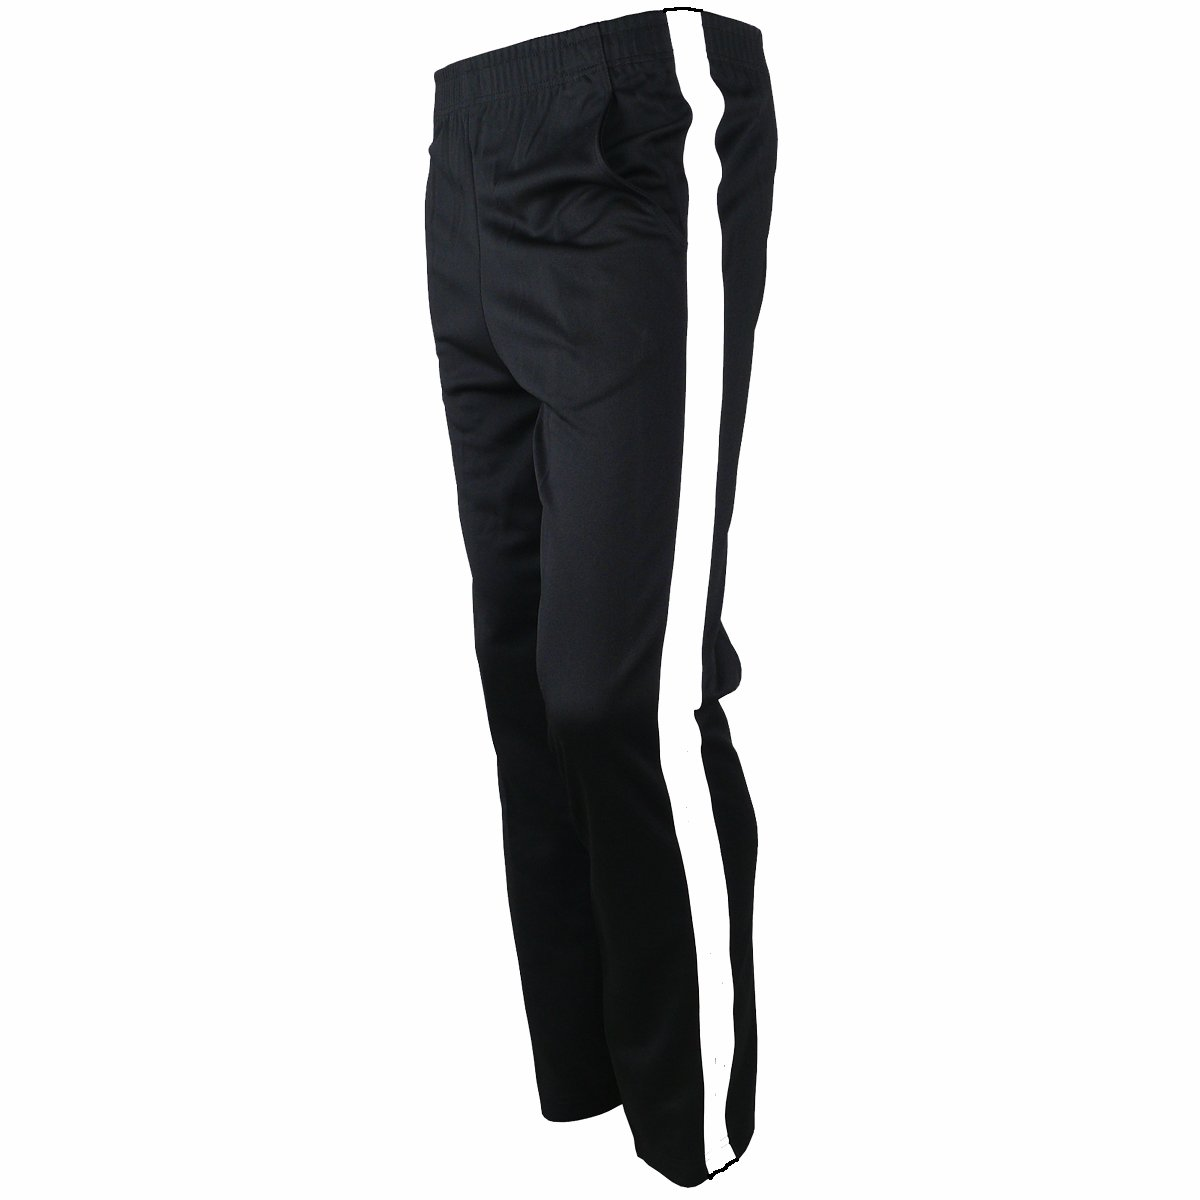 myglory77mall メンズ ランニング ジョギング用ズボン 陸上パンツ ウォームアップパンツ トレーニングウェア B01K13HRKG S US(L Asian Tag)|Black One Line Black One Line S US(L Asian Tag)